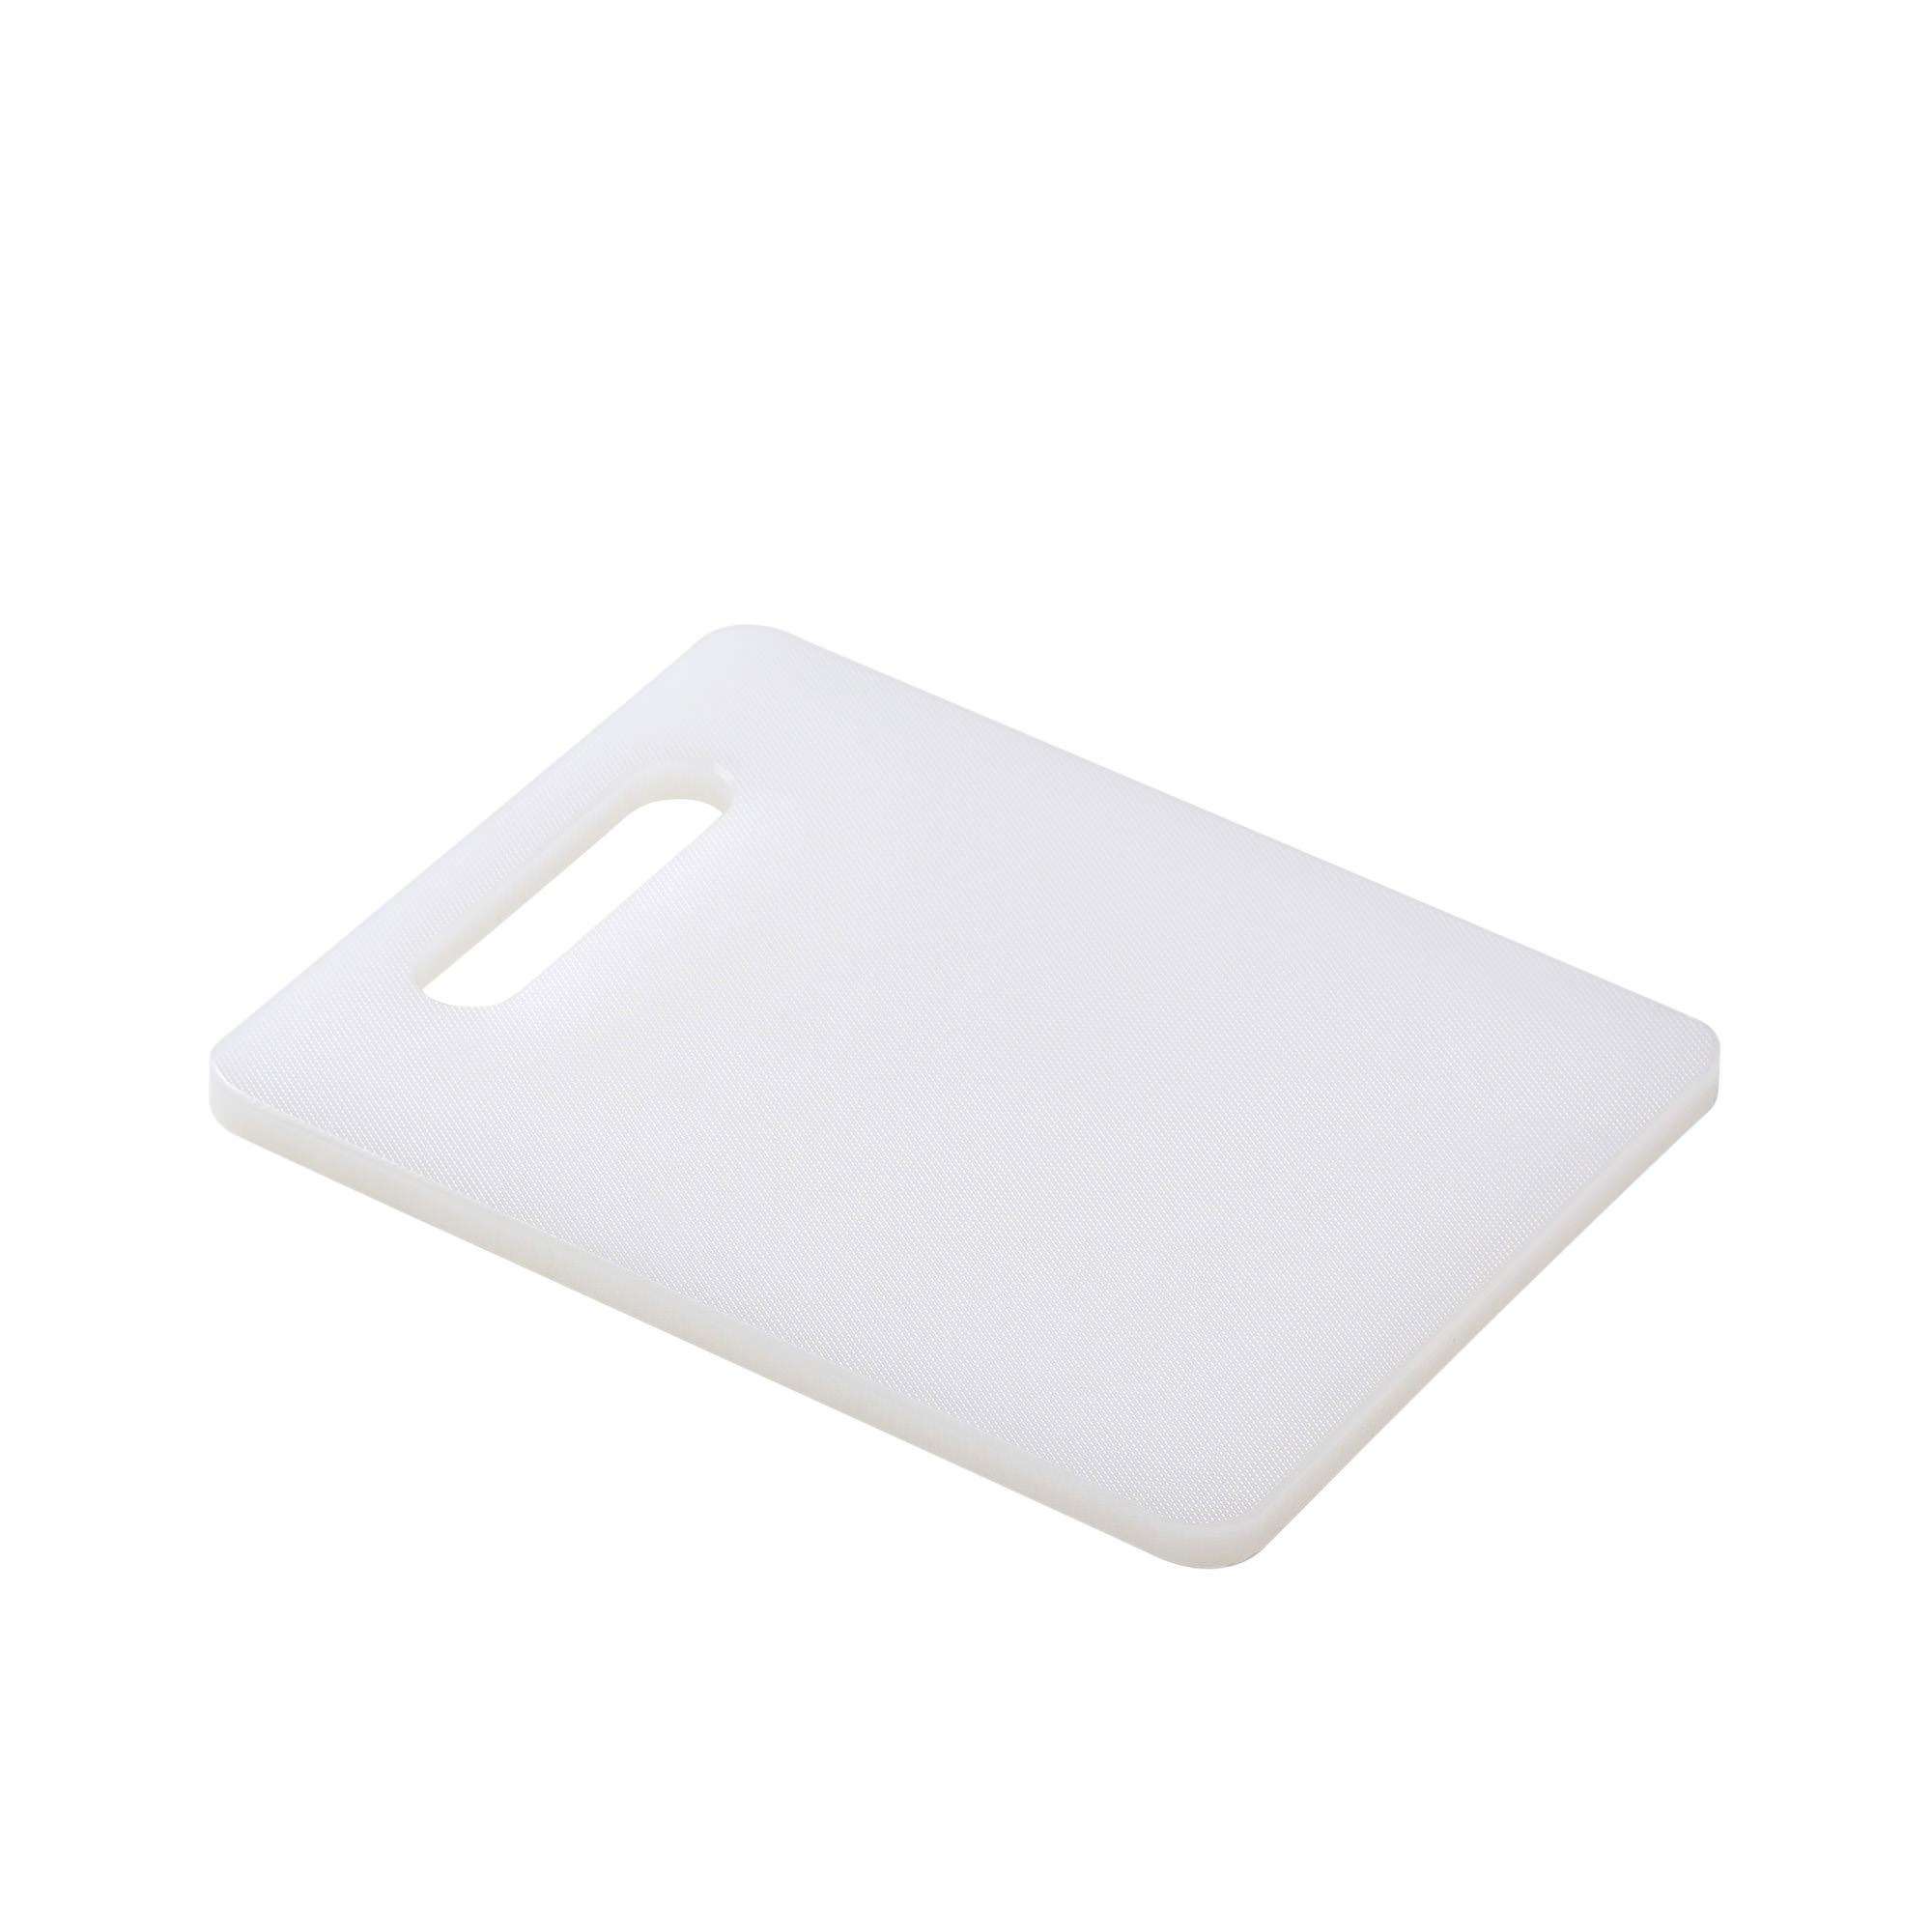 Kitchen Pro Classic Cutting Board 25x20x1.2cm White